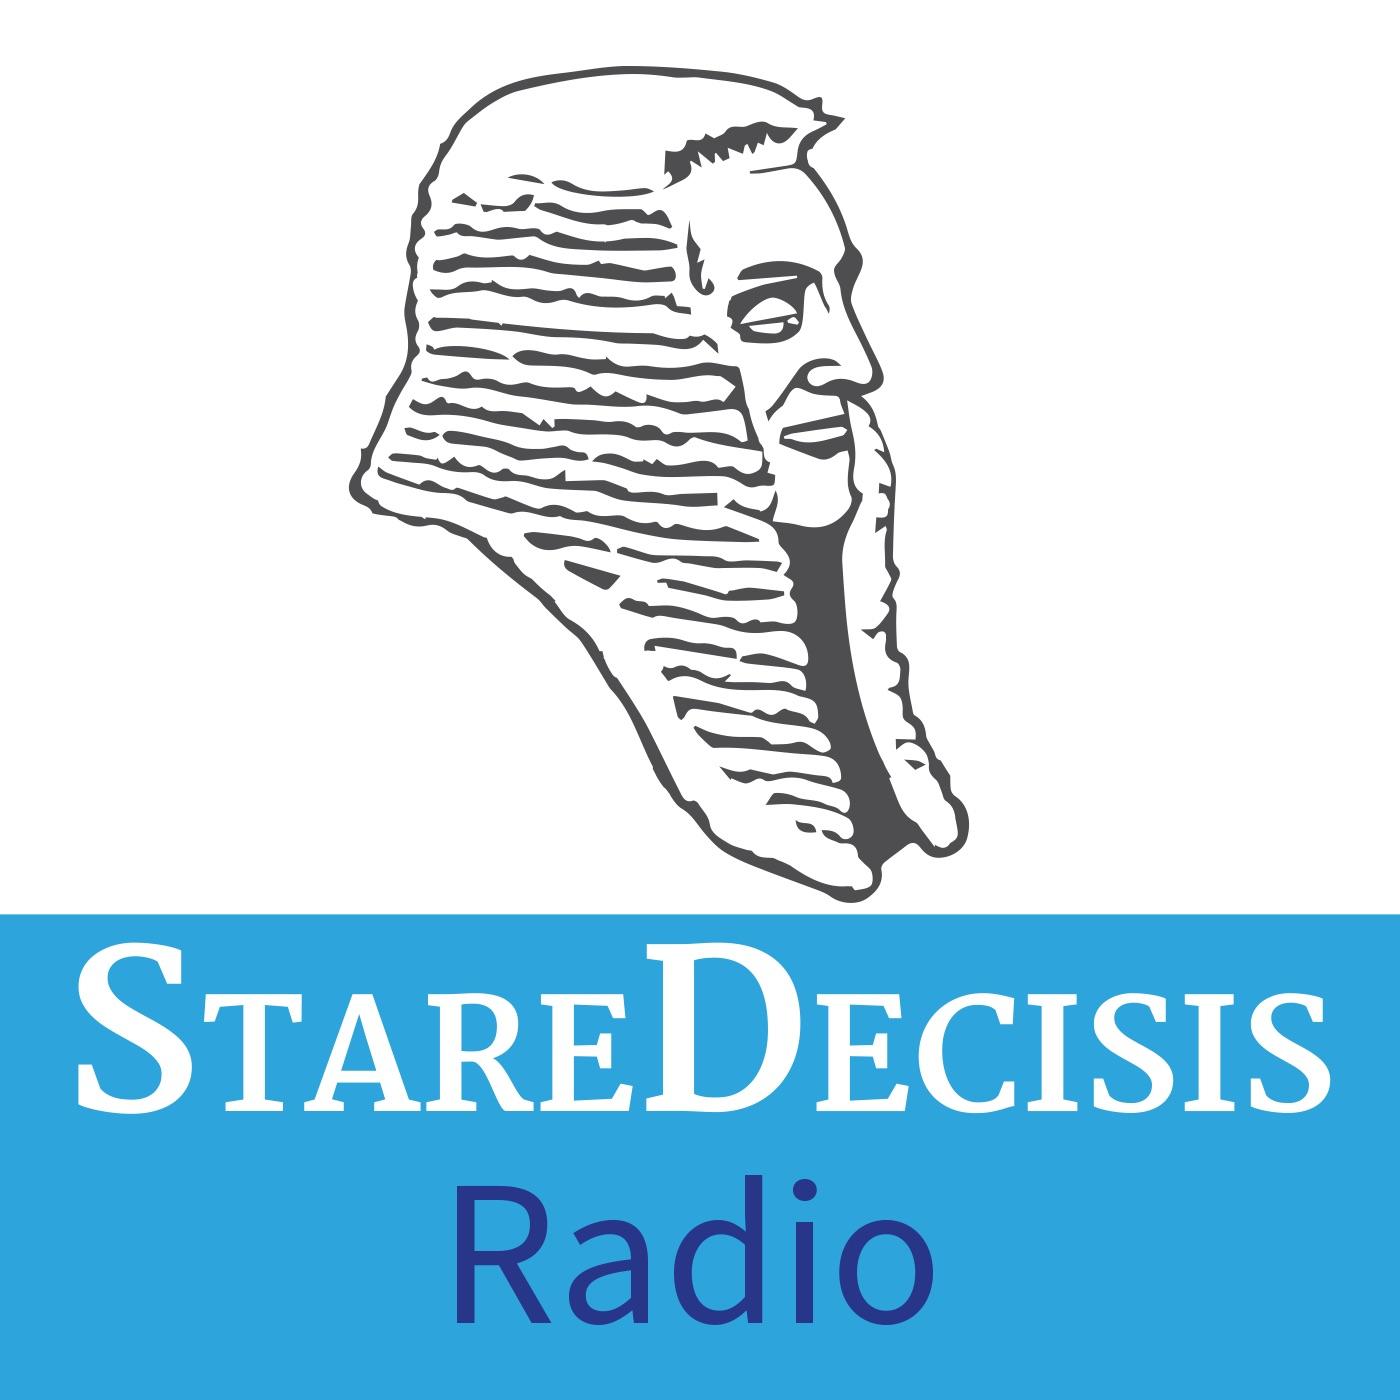 Stare Decisis Radio